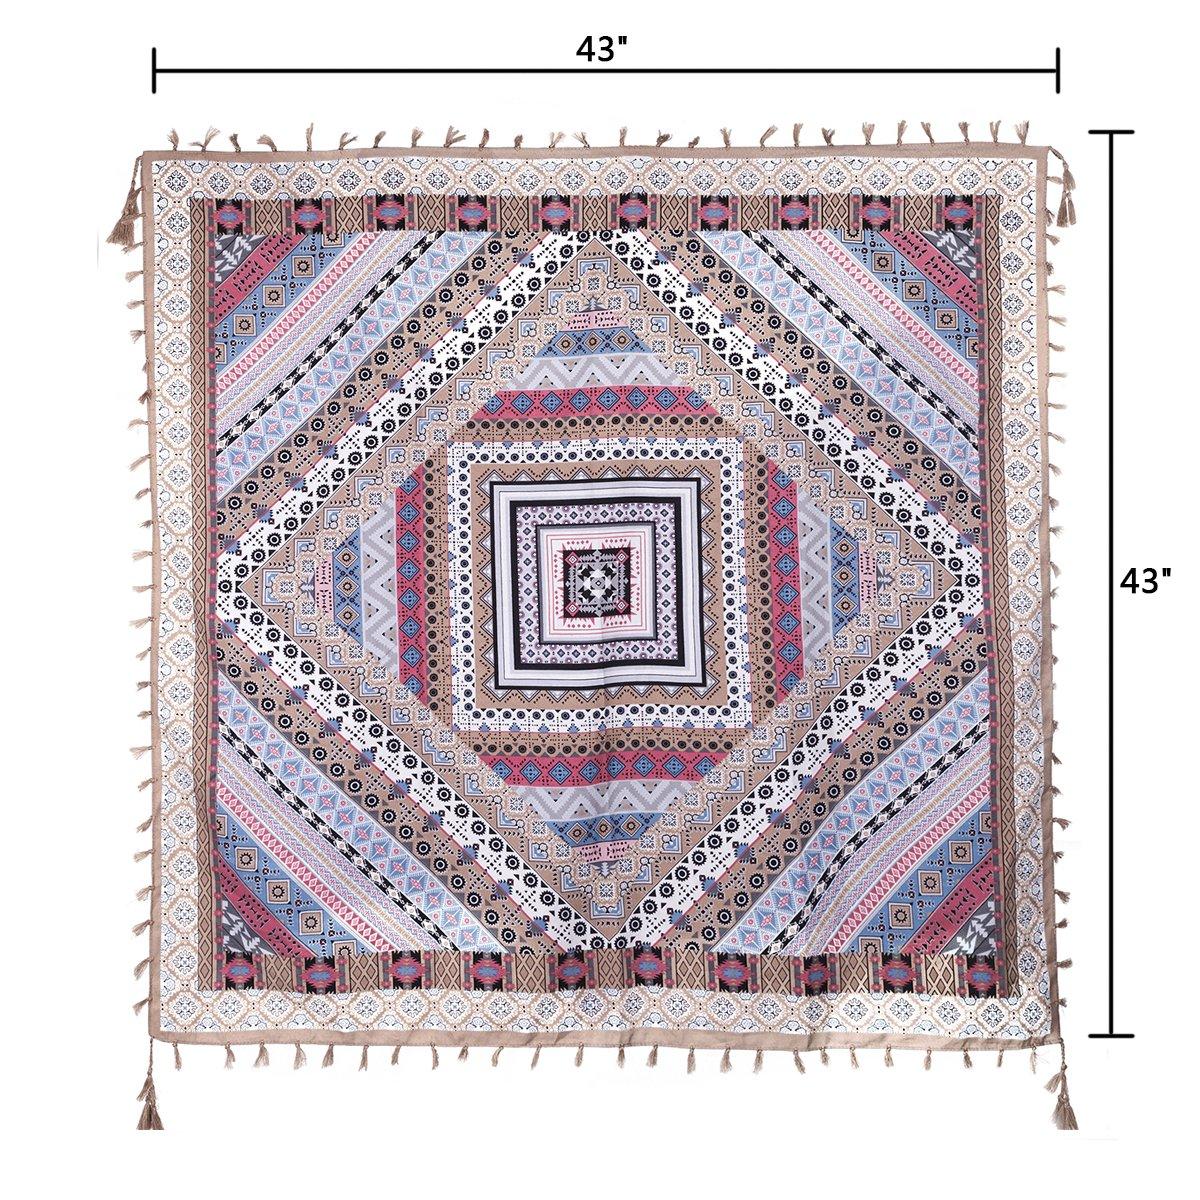 EVRFELAN Women Boho Scarf Tassel Shawl Tapestry Tablecloth Beach Towel Picnic Throw Wall Hanging Yoga Mat Ladies Cotton Scarves by Popular Handicrafts (Khaki)